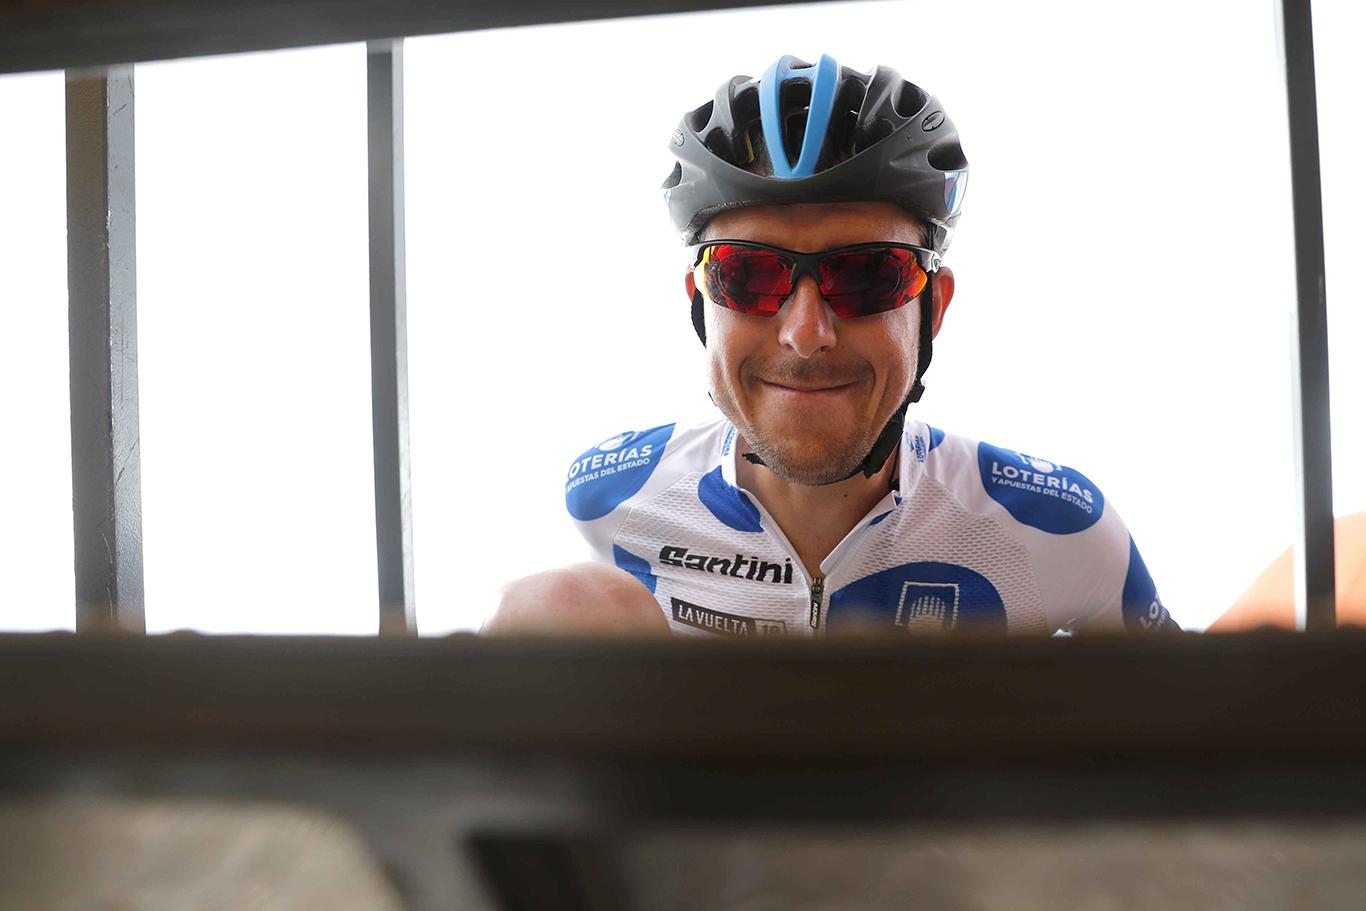 Cycling: Vuelta España 2019 / Tour of Spain 2019/ La Vuelta/ Etapa 16/ Stage 16/ CONTROL DE FIRMAS/ MAILLOT MONTAÑA/ MOUNTAIN JERSEY / MADRAZO RUIZ Angel (ESP)Pravia - Alto de La Cubilla. Lena (144,4 km) 09-09-2019/Vuelta España 2019 / La Vuelta/ Tour of Spain 2019/Luis Angel Gomez ©PHOTOGOMEZSPORT2019